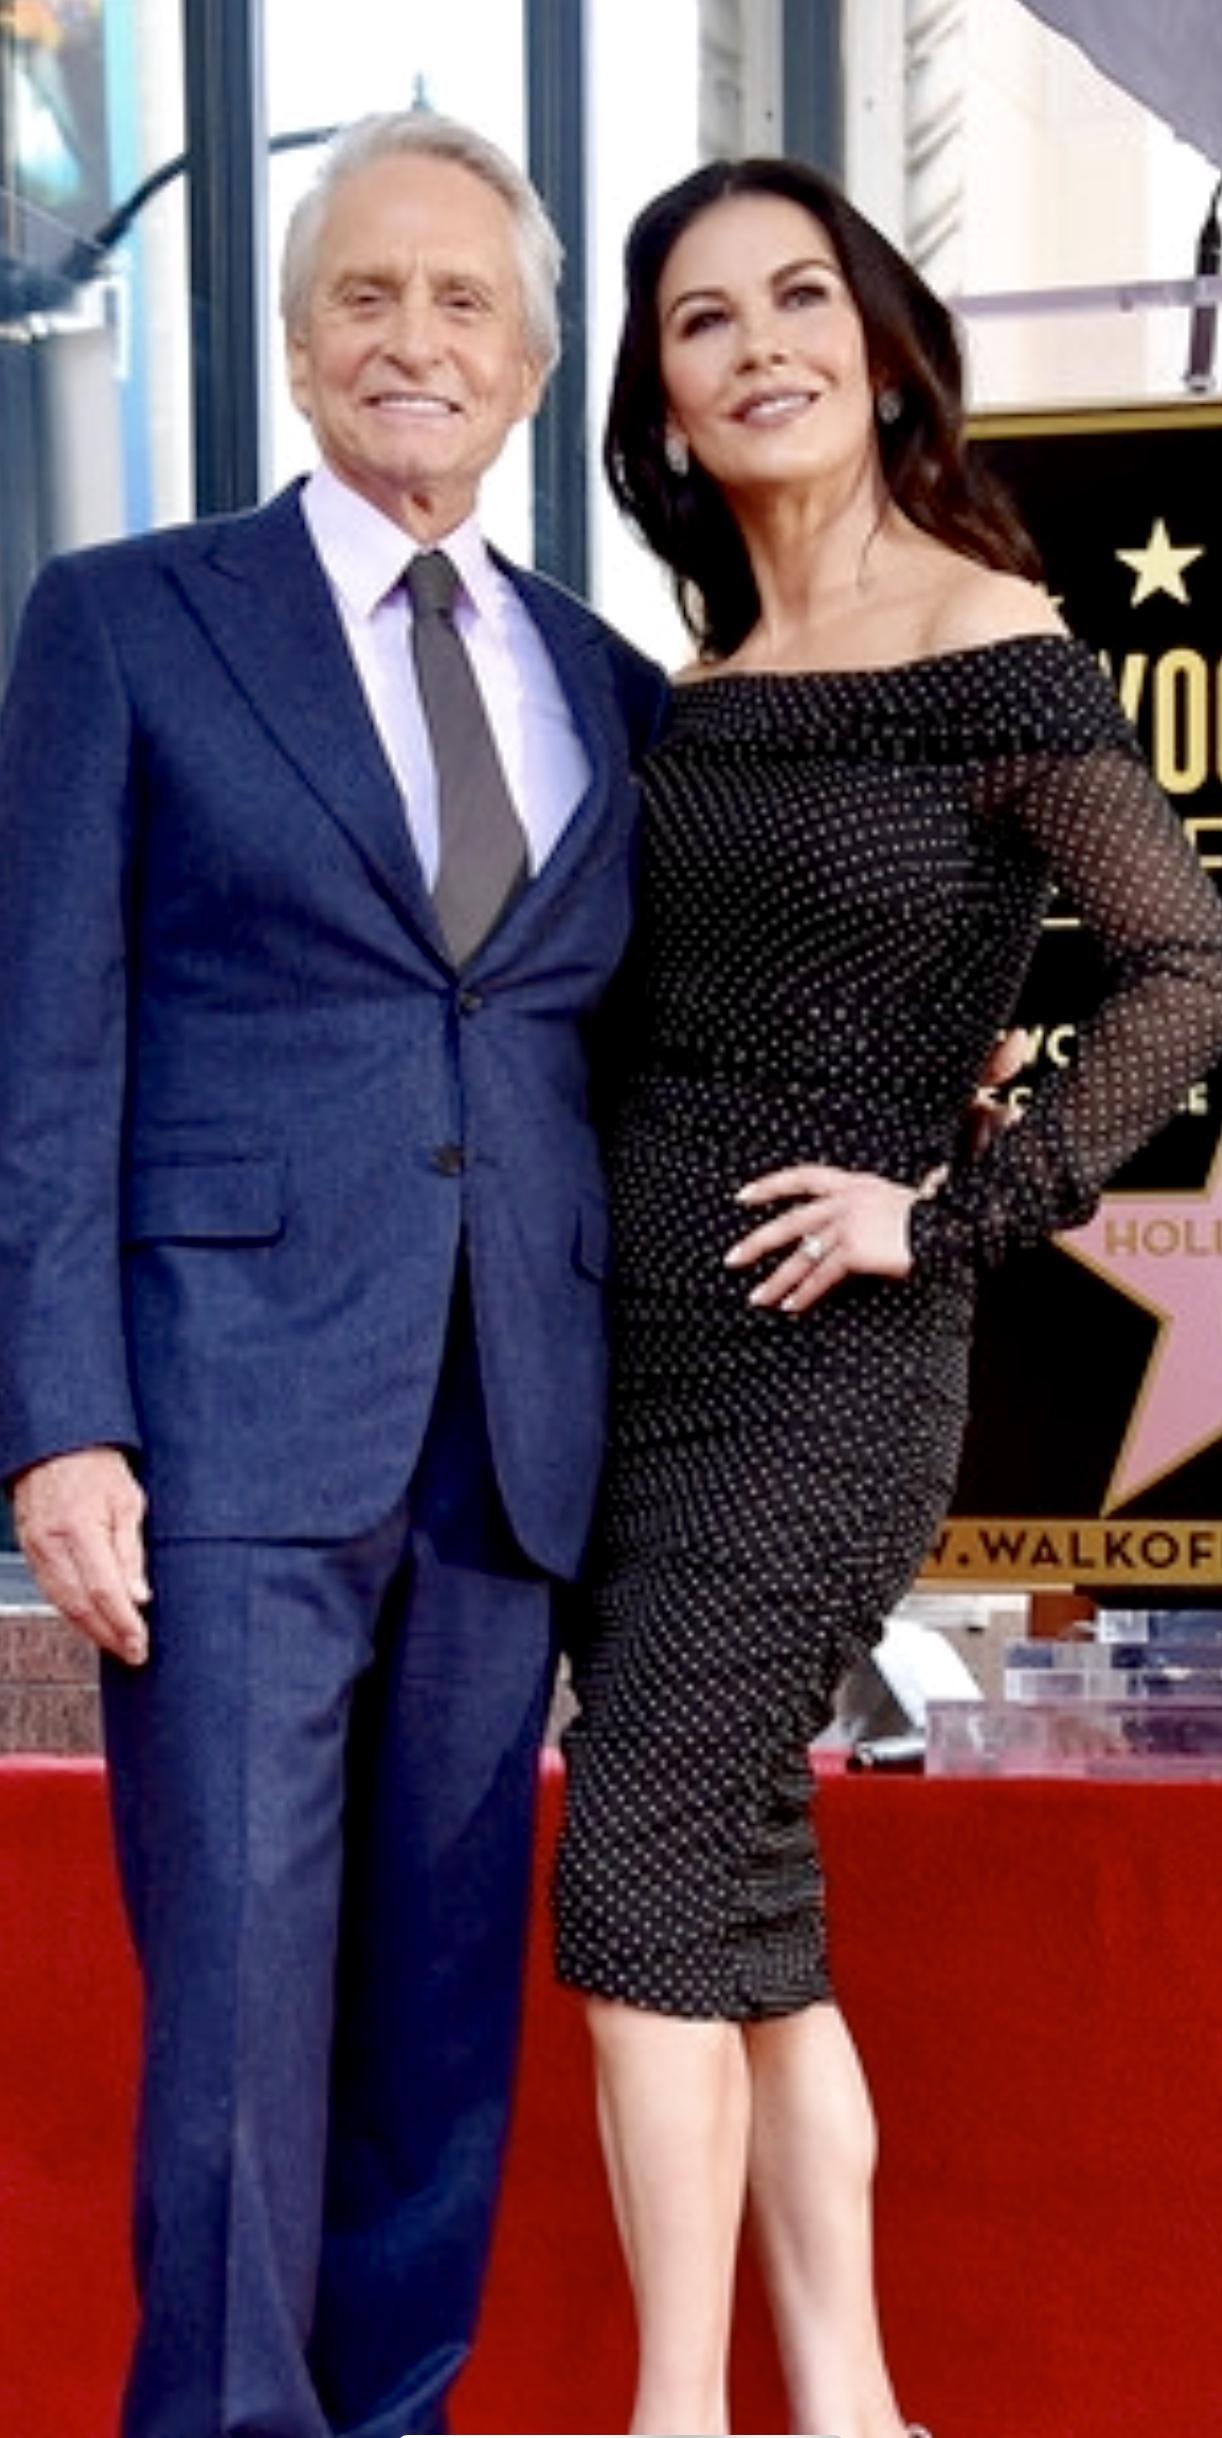 Life Stories: Michael Douglas and Catherine Zeta-Jones 147 Views